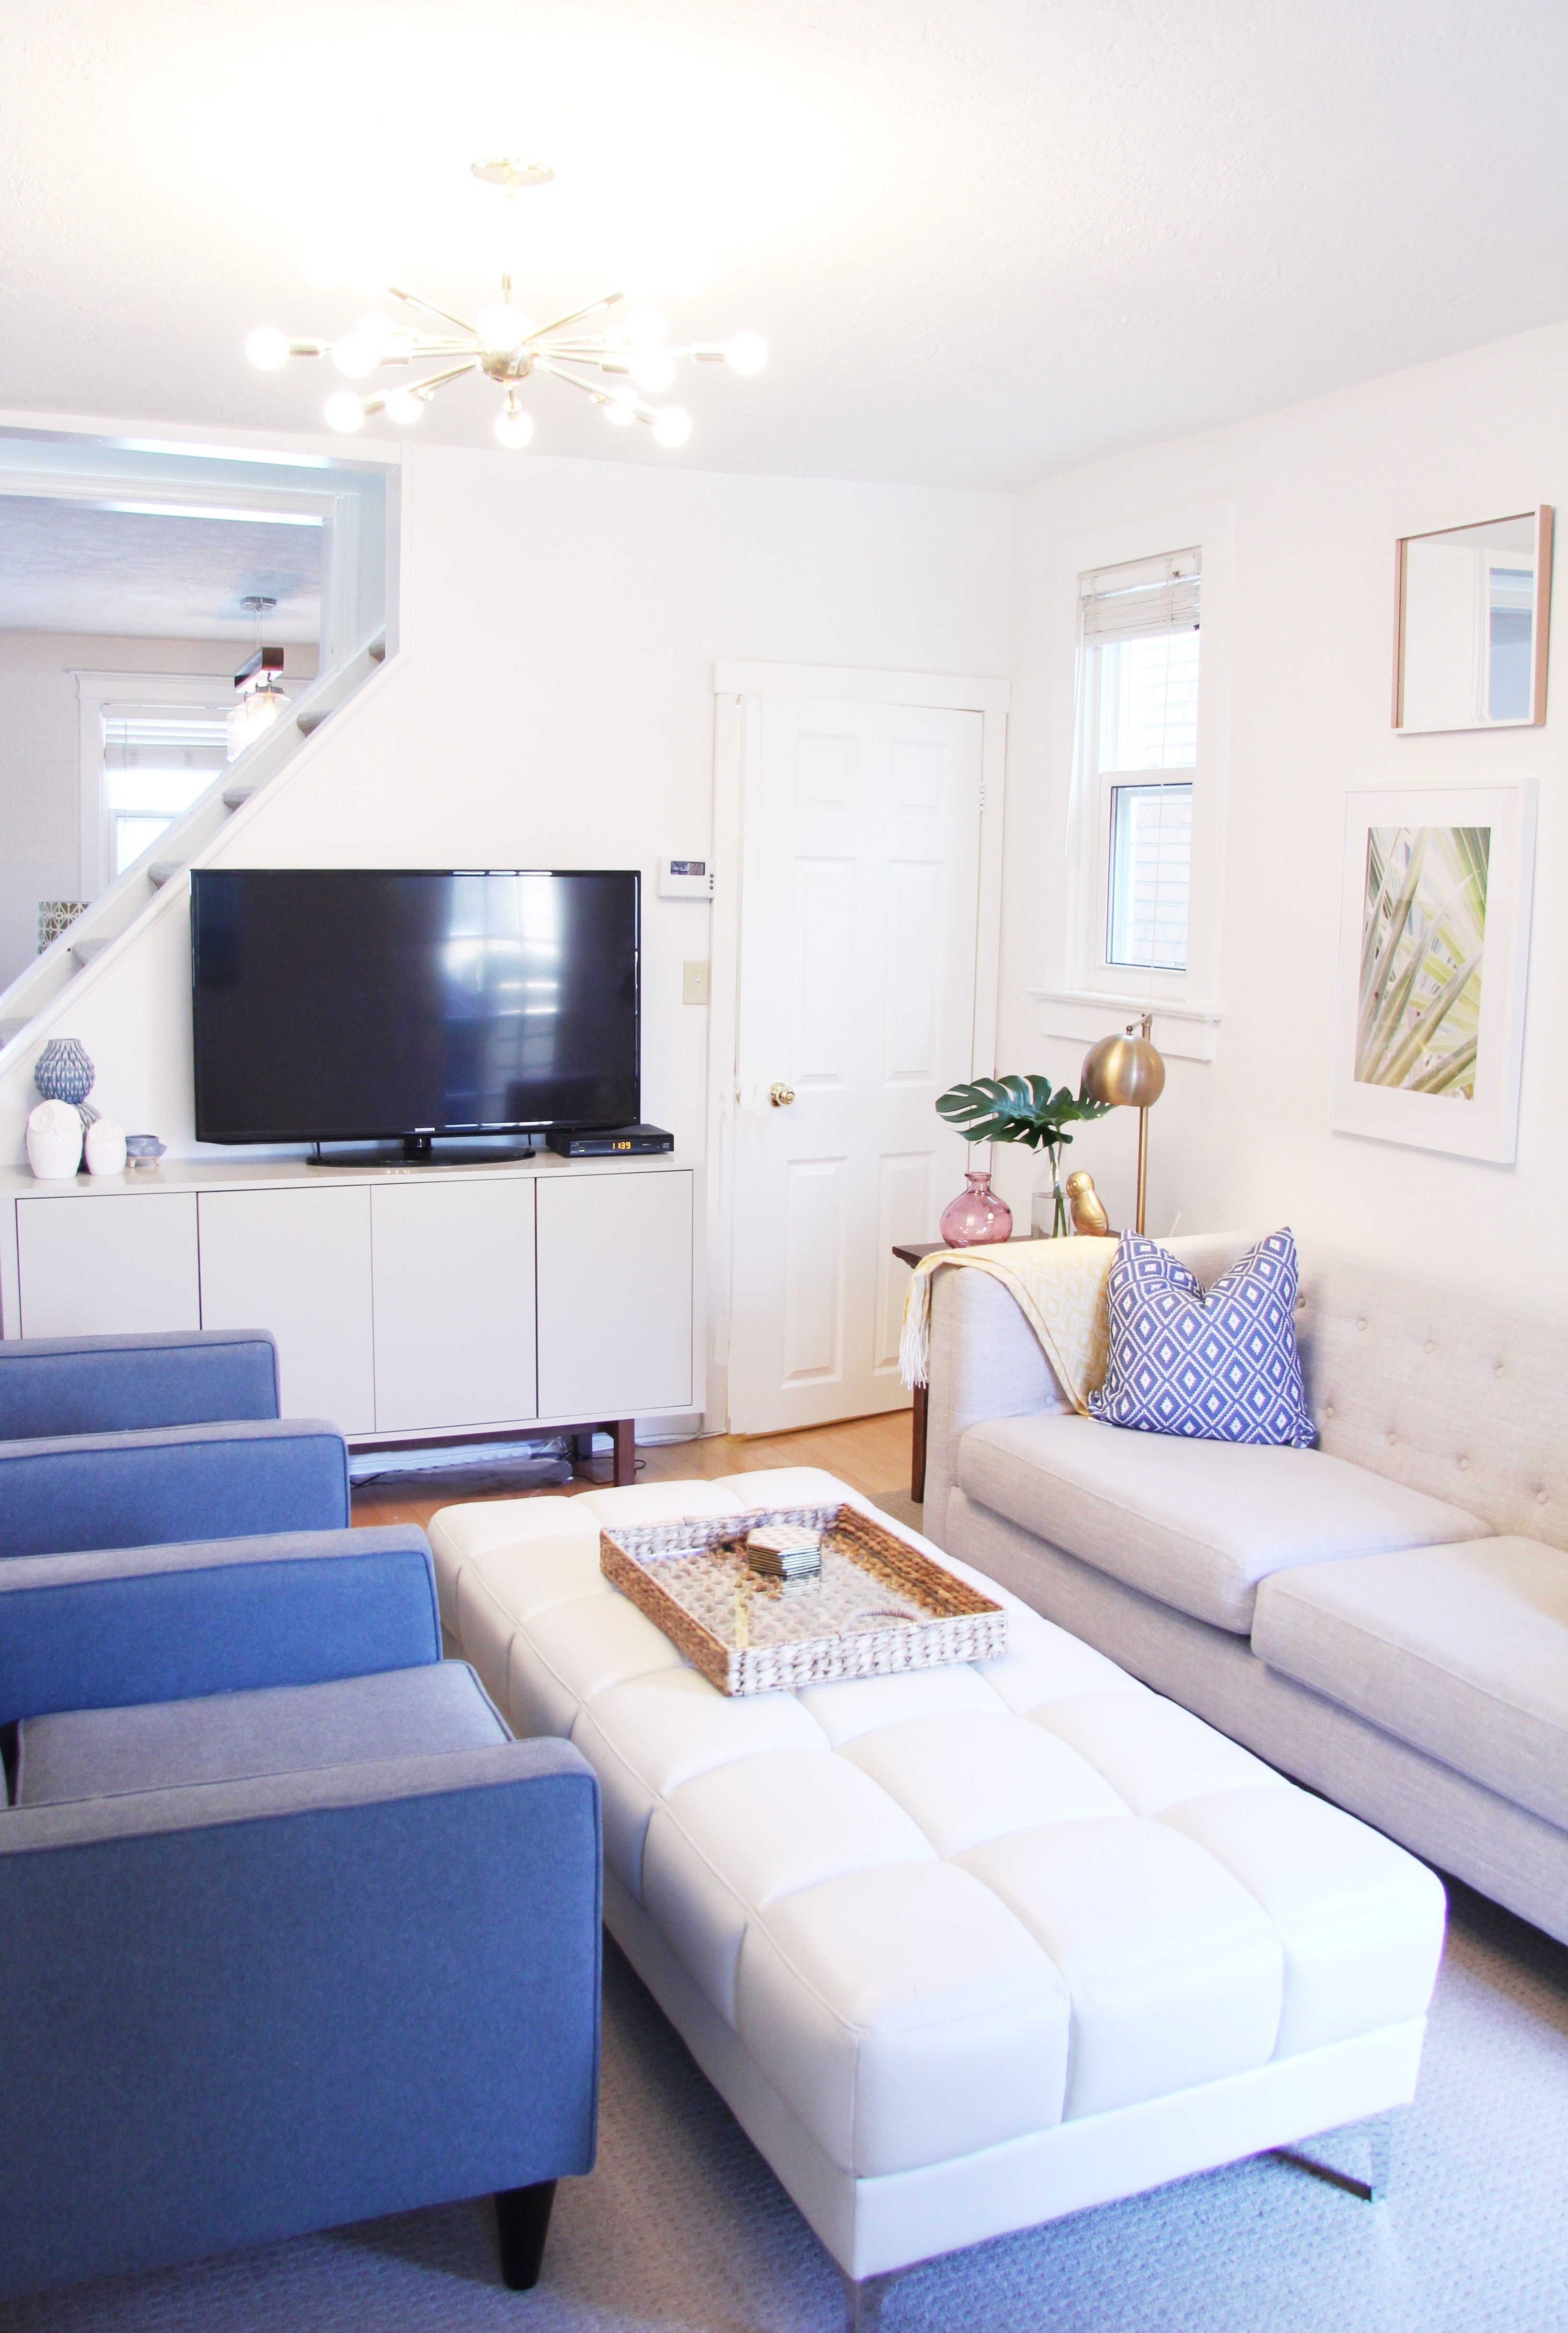 61 Family Friendly Living Room Interior Ideas: Family Friendly Living Room Makeover